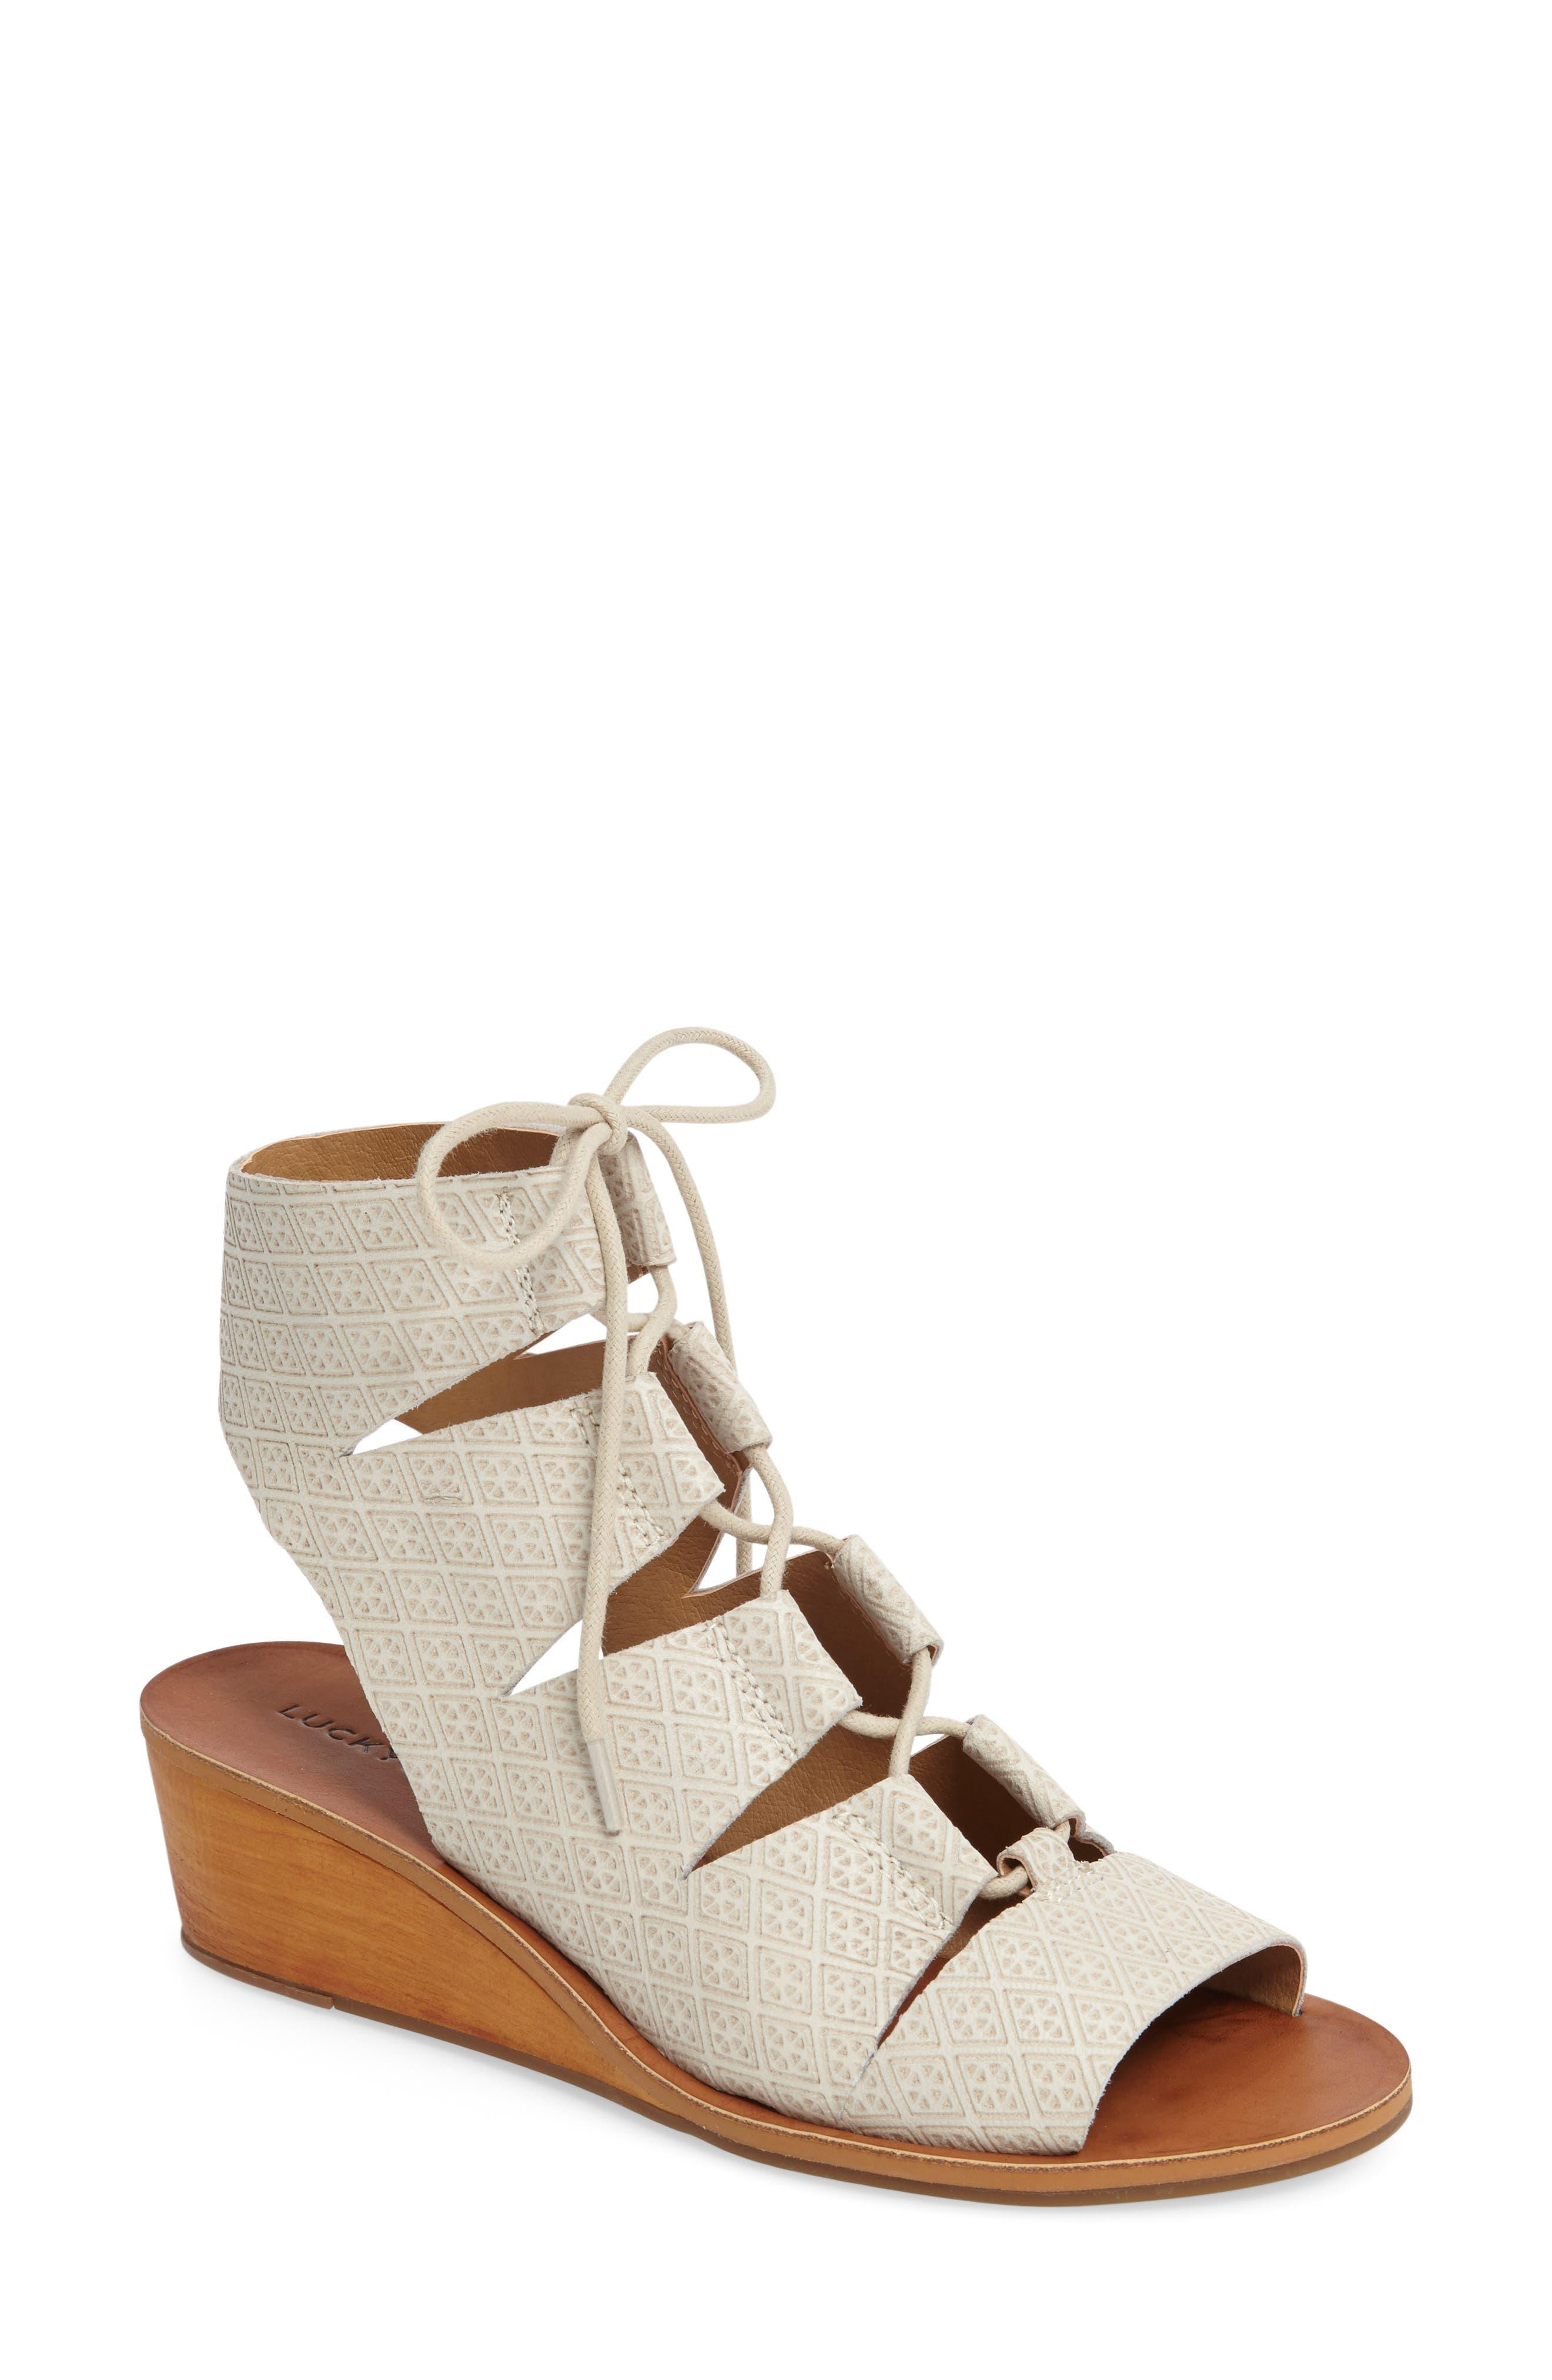 Gizi Wedge Sandal,                             Main thumbnail 1, color,                             Sand Shell Leather